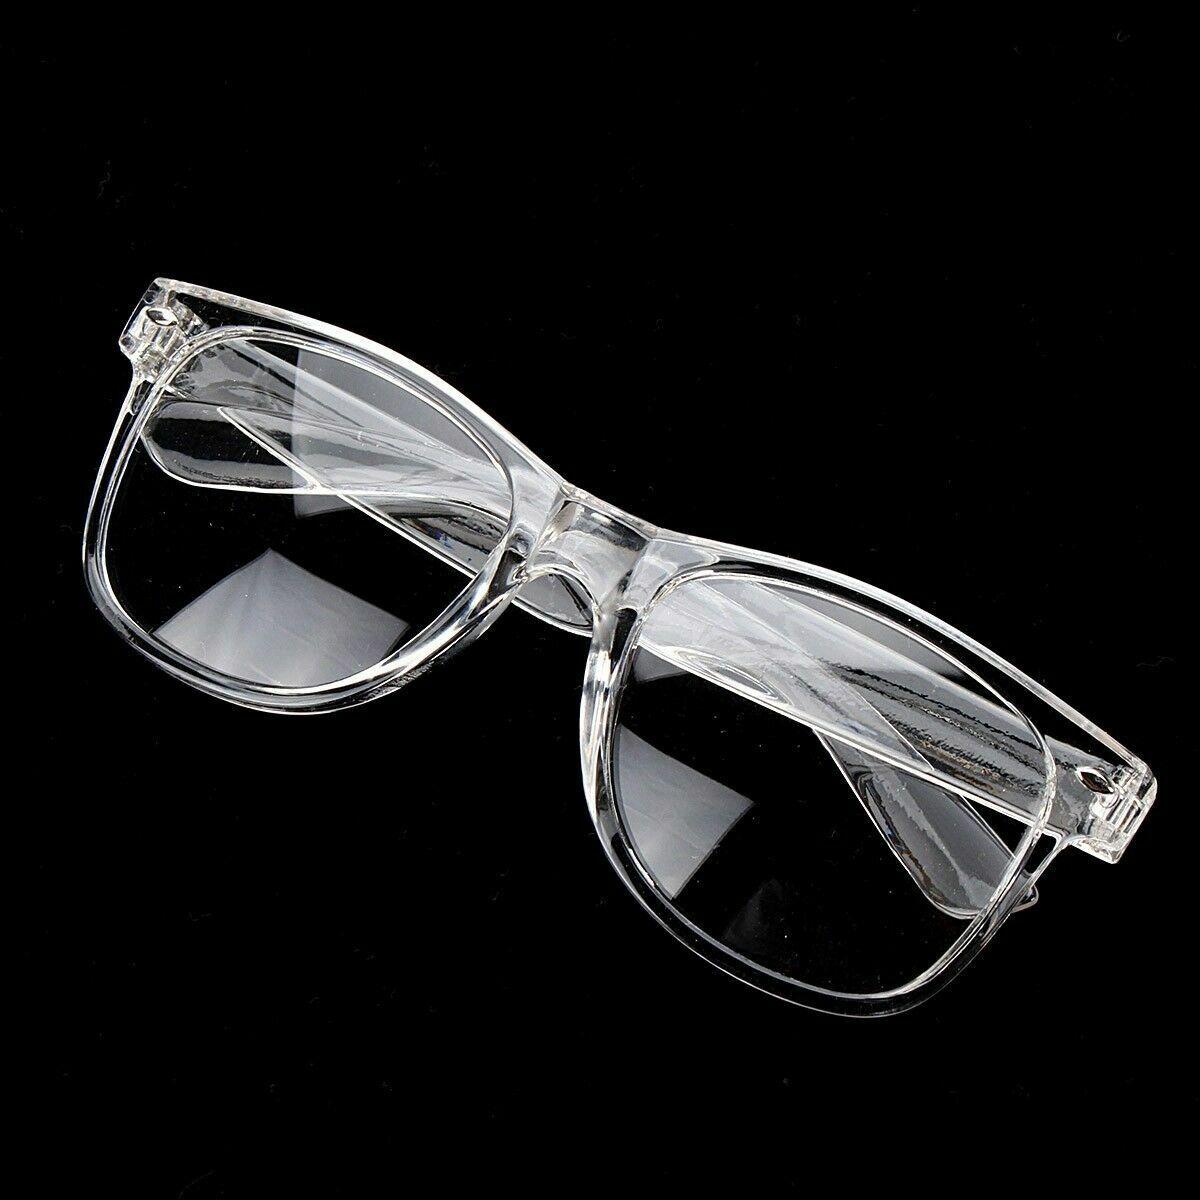 White Crystal Clear Translucent Square Celebrity Diva Frames